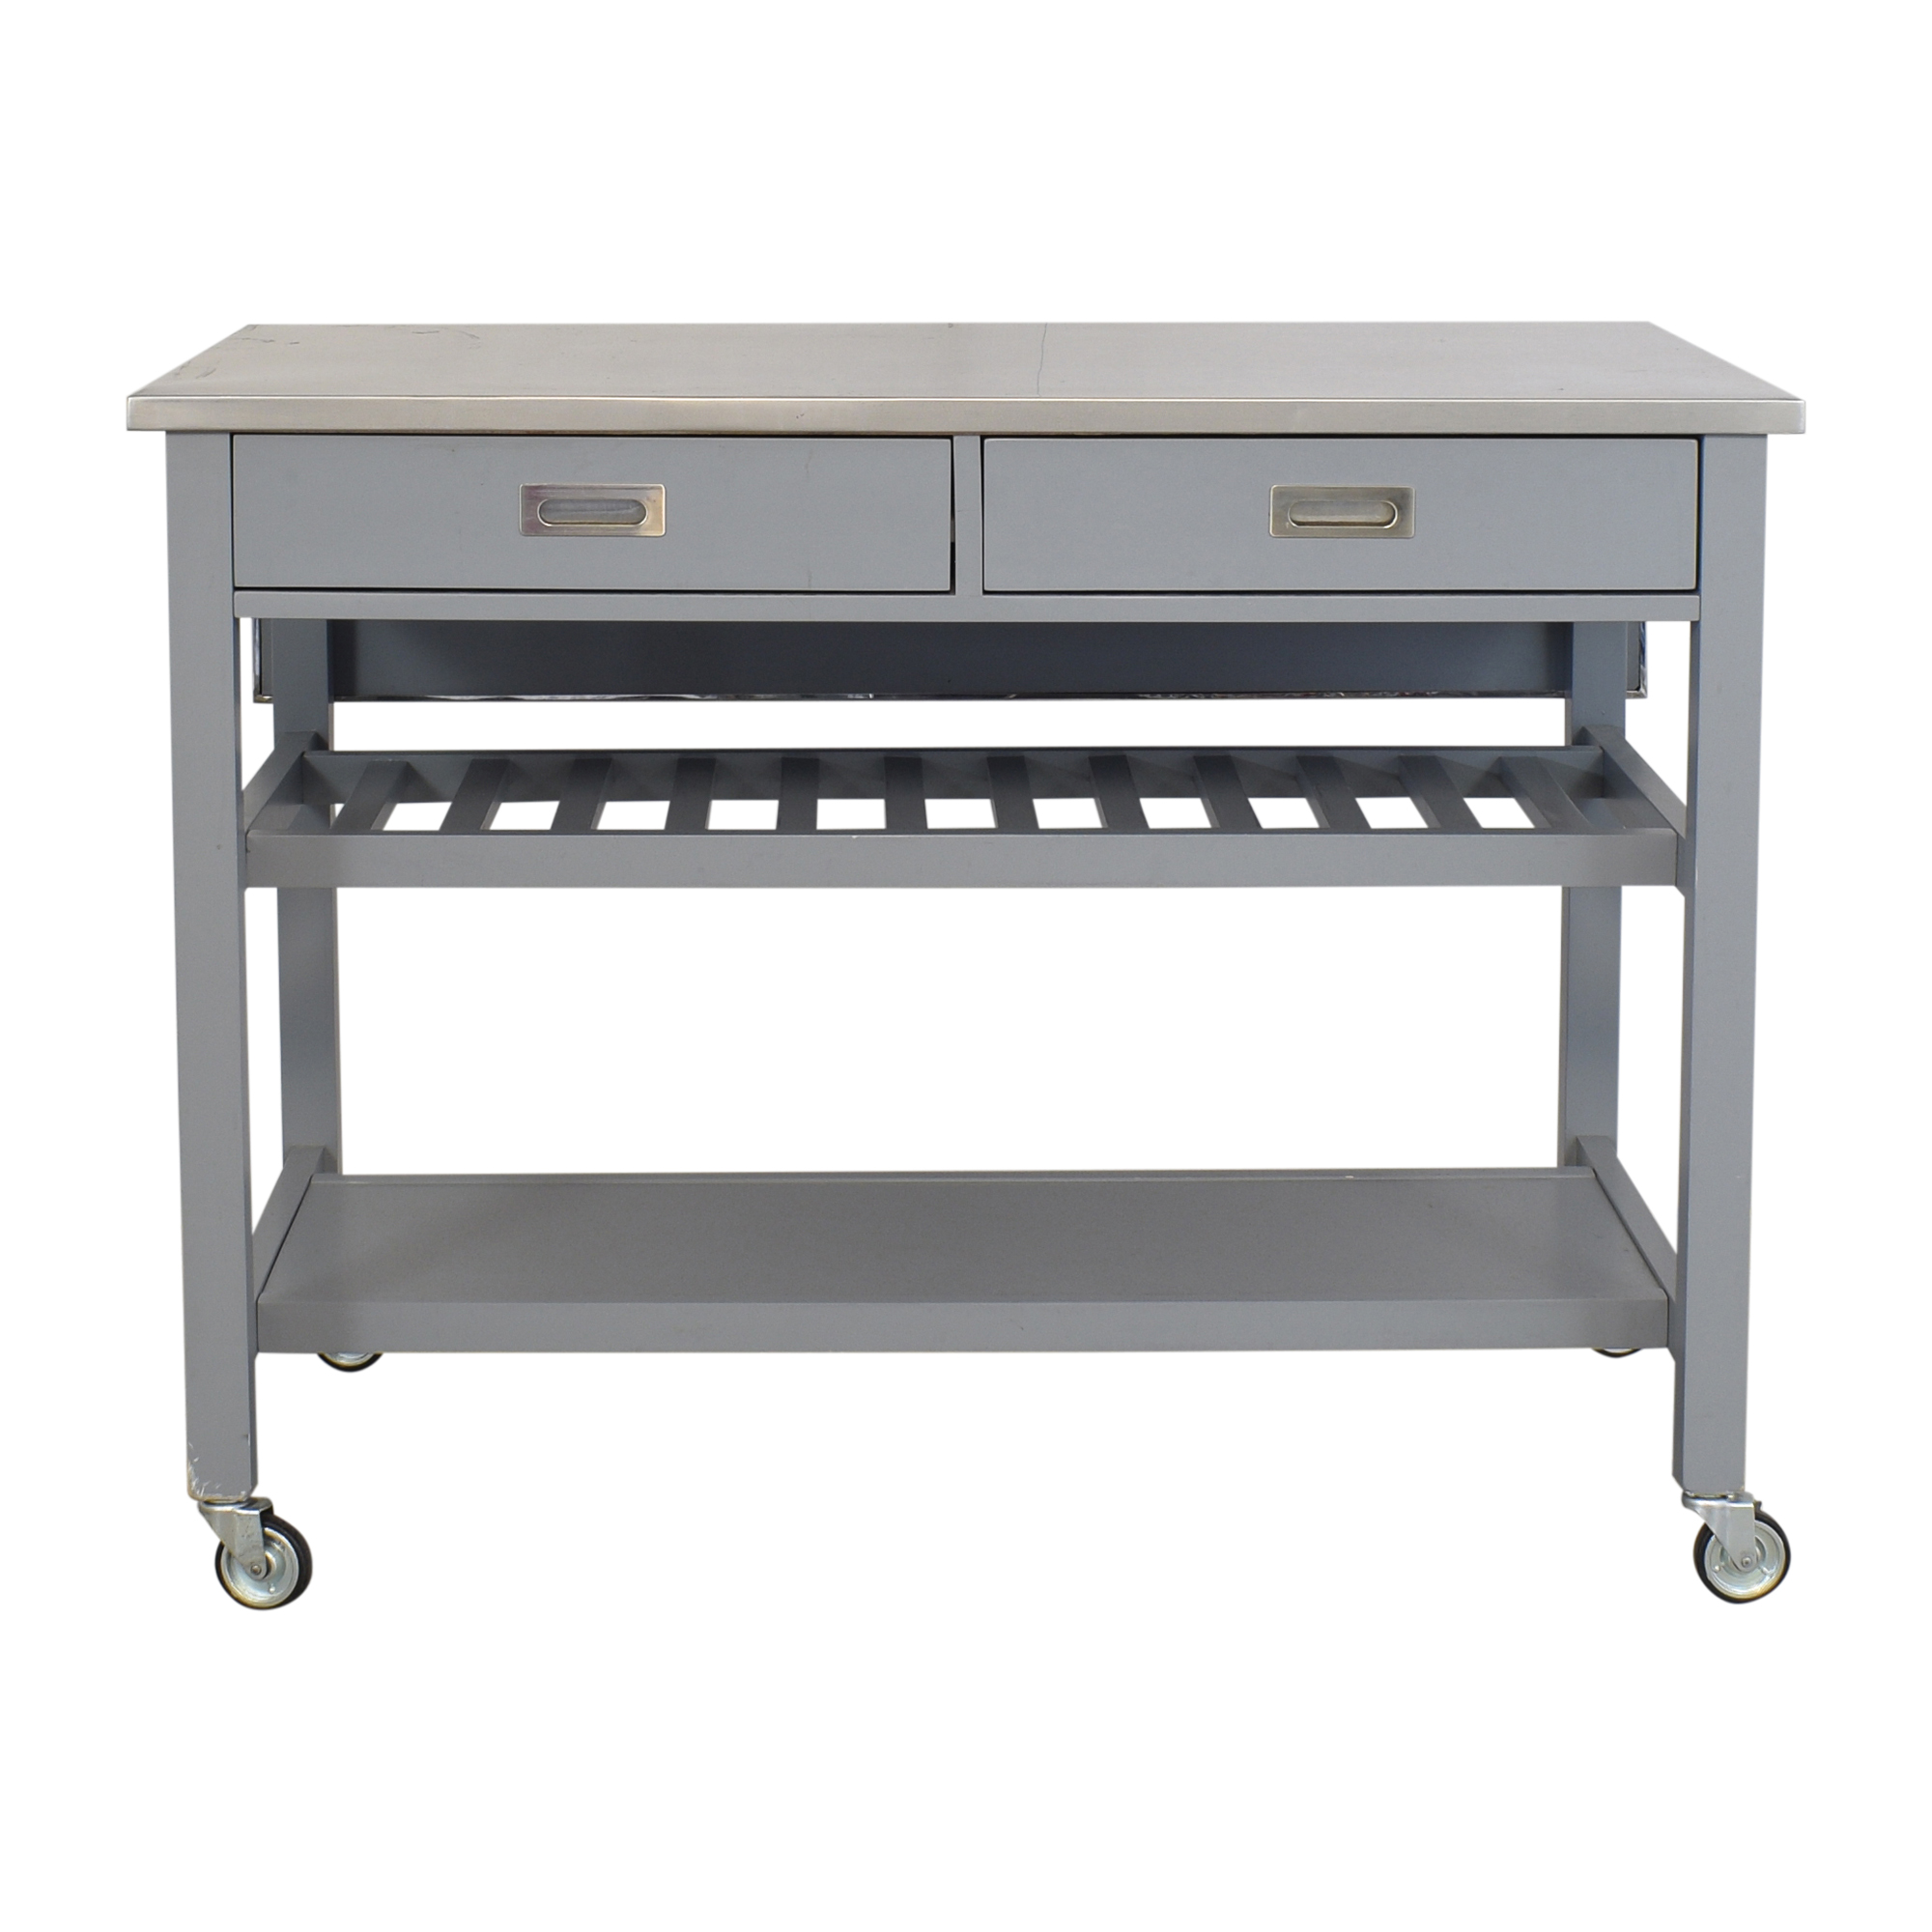 shop Crate & Barrel Belmont Open Kitchen Island Crate & Barrel Utility Tables